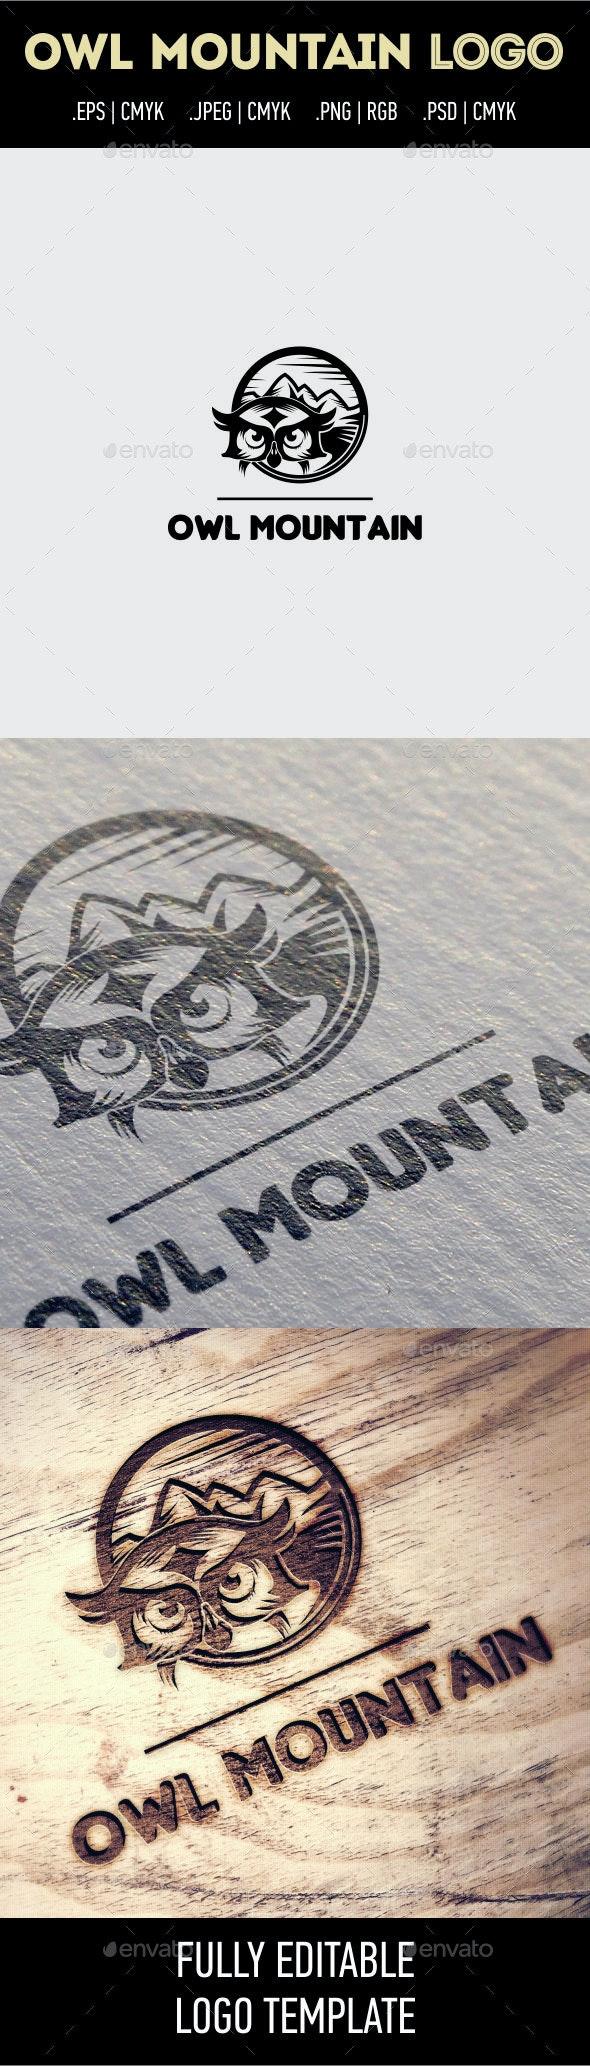 Owl Mountain Logo - Animals Logo Templates